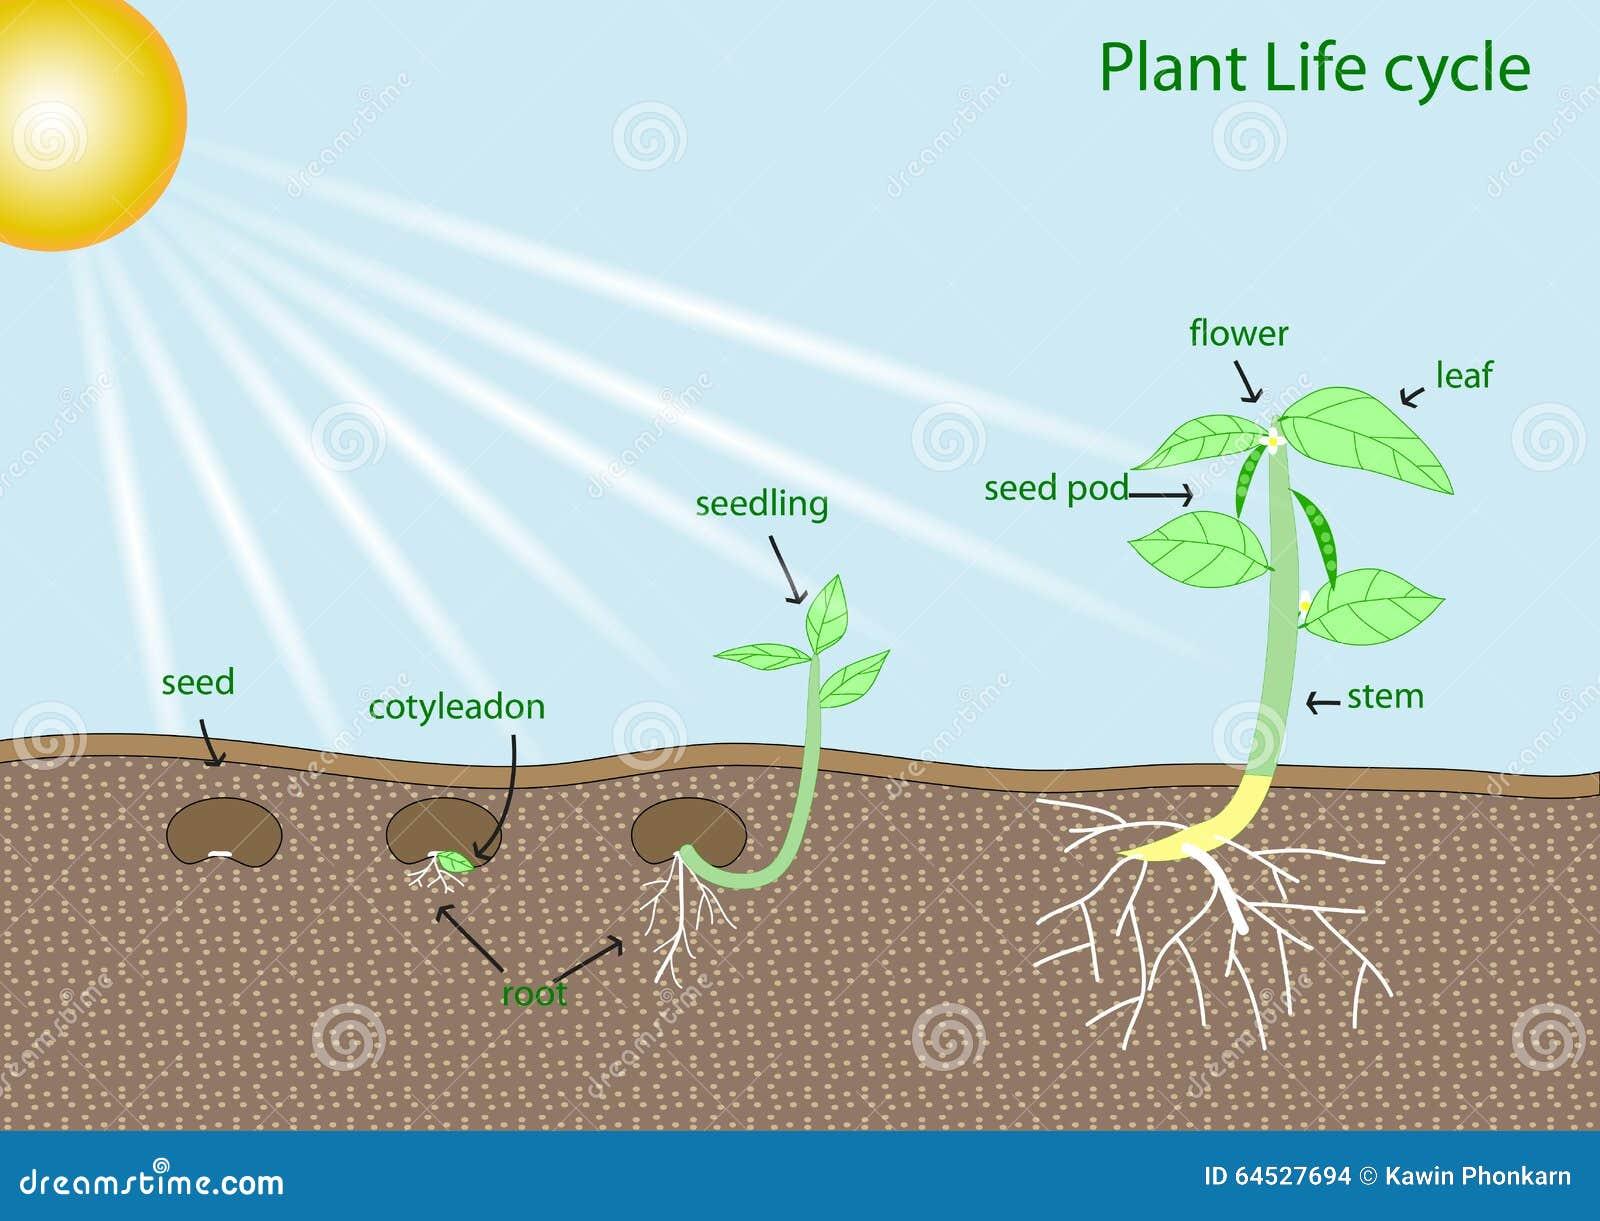 Stock De Ilustraci%C3%B3n Ciclo De Vida De La Planta Image64527694 on Basic Plant Life Cycle